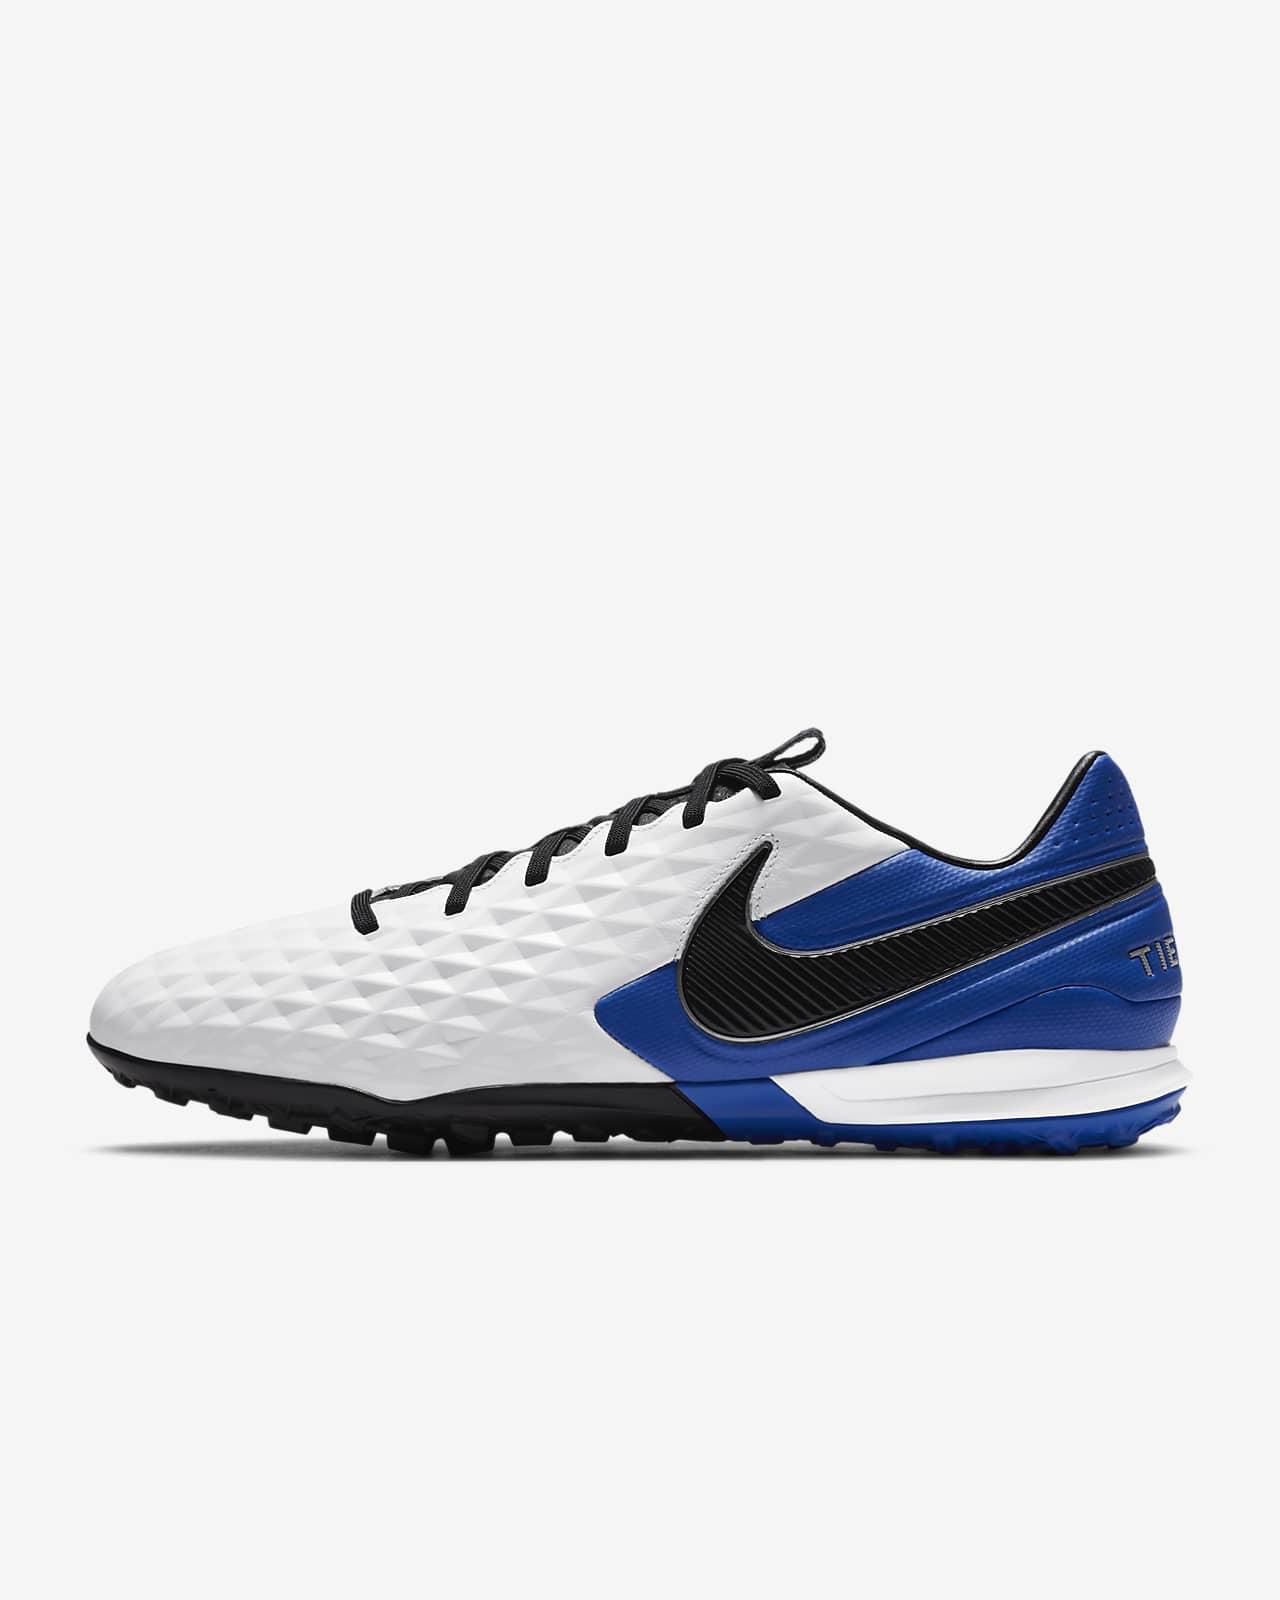 Nike Tiempo Legend 8 Pro TF Artificial-Turf Football Shoe